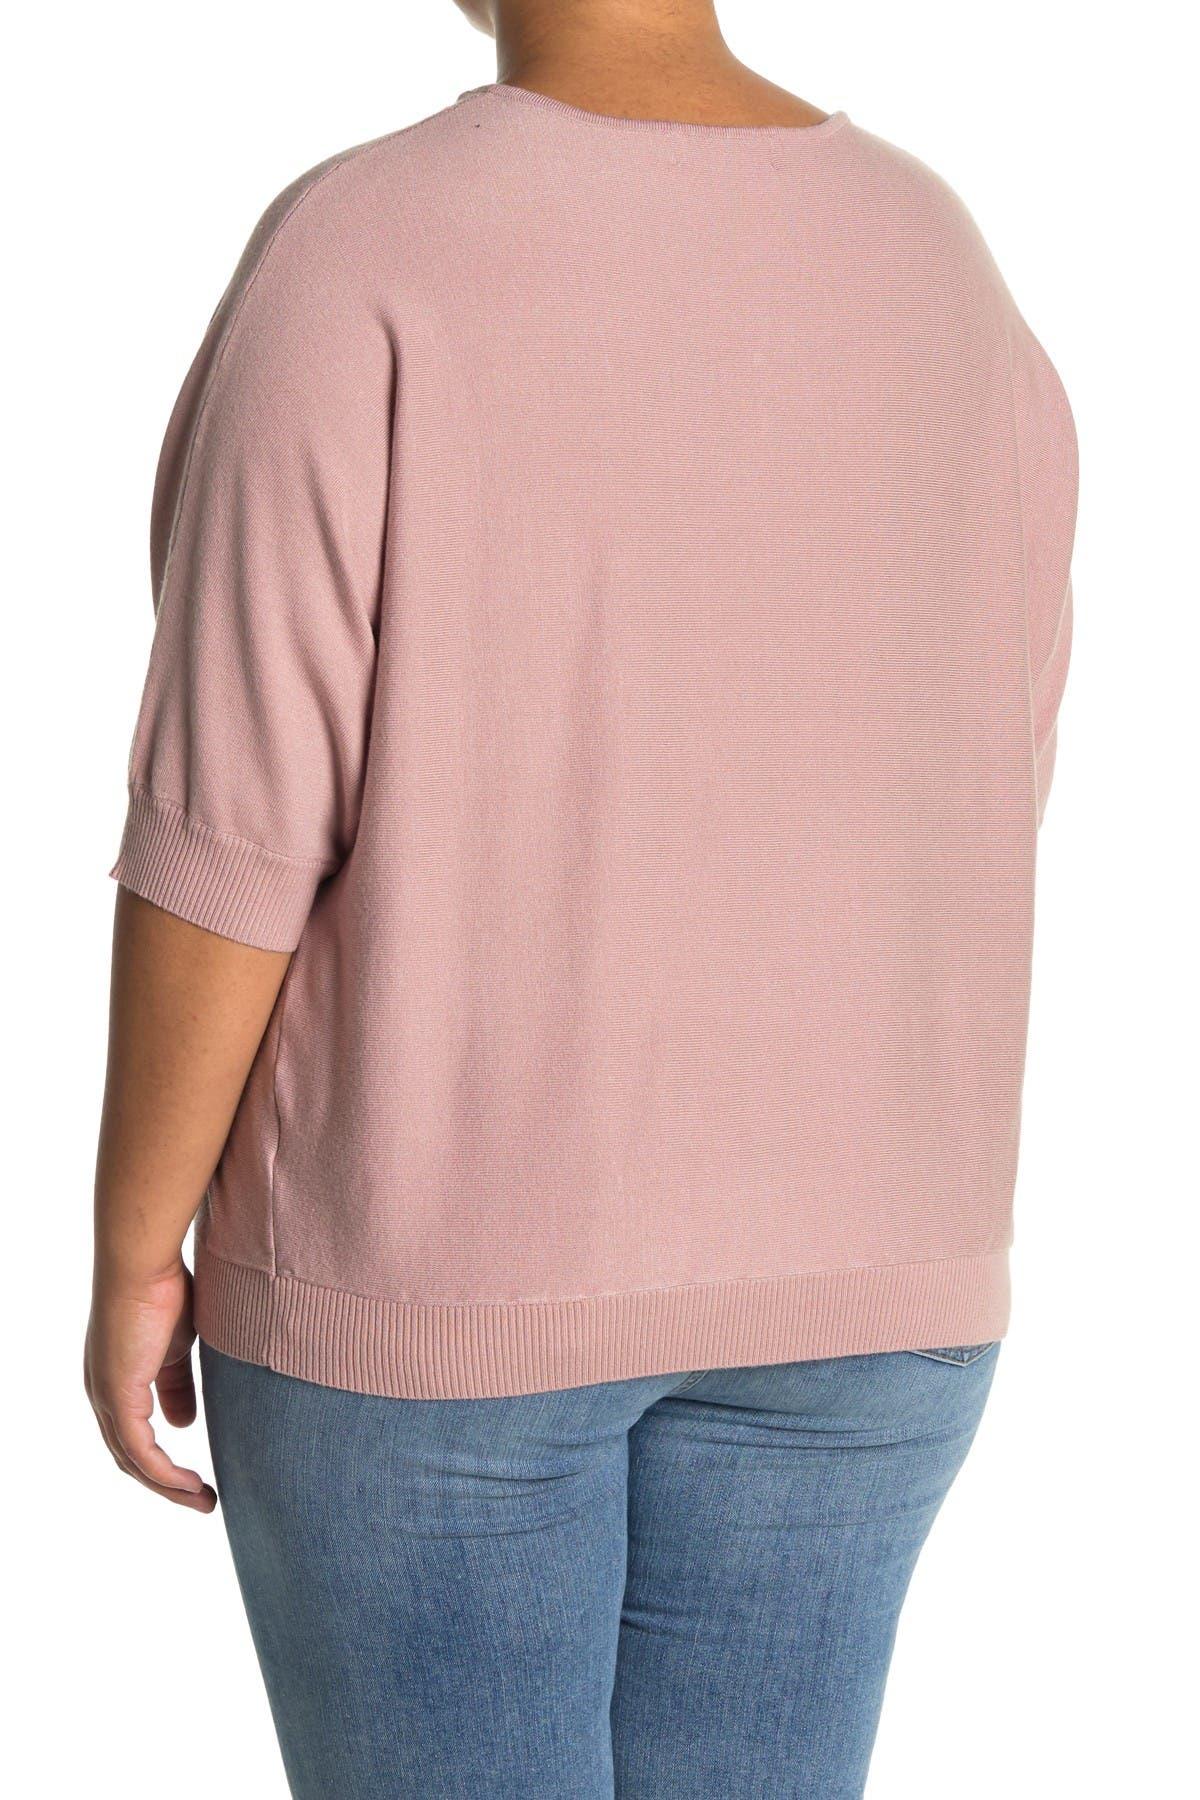 Image of philosophy V-Neck 3/4 Length Sleeve Sweater